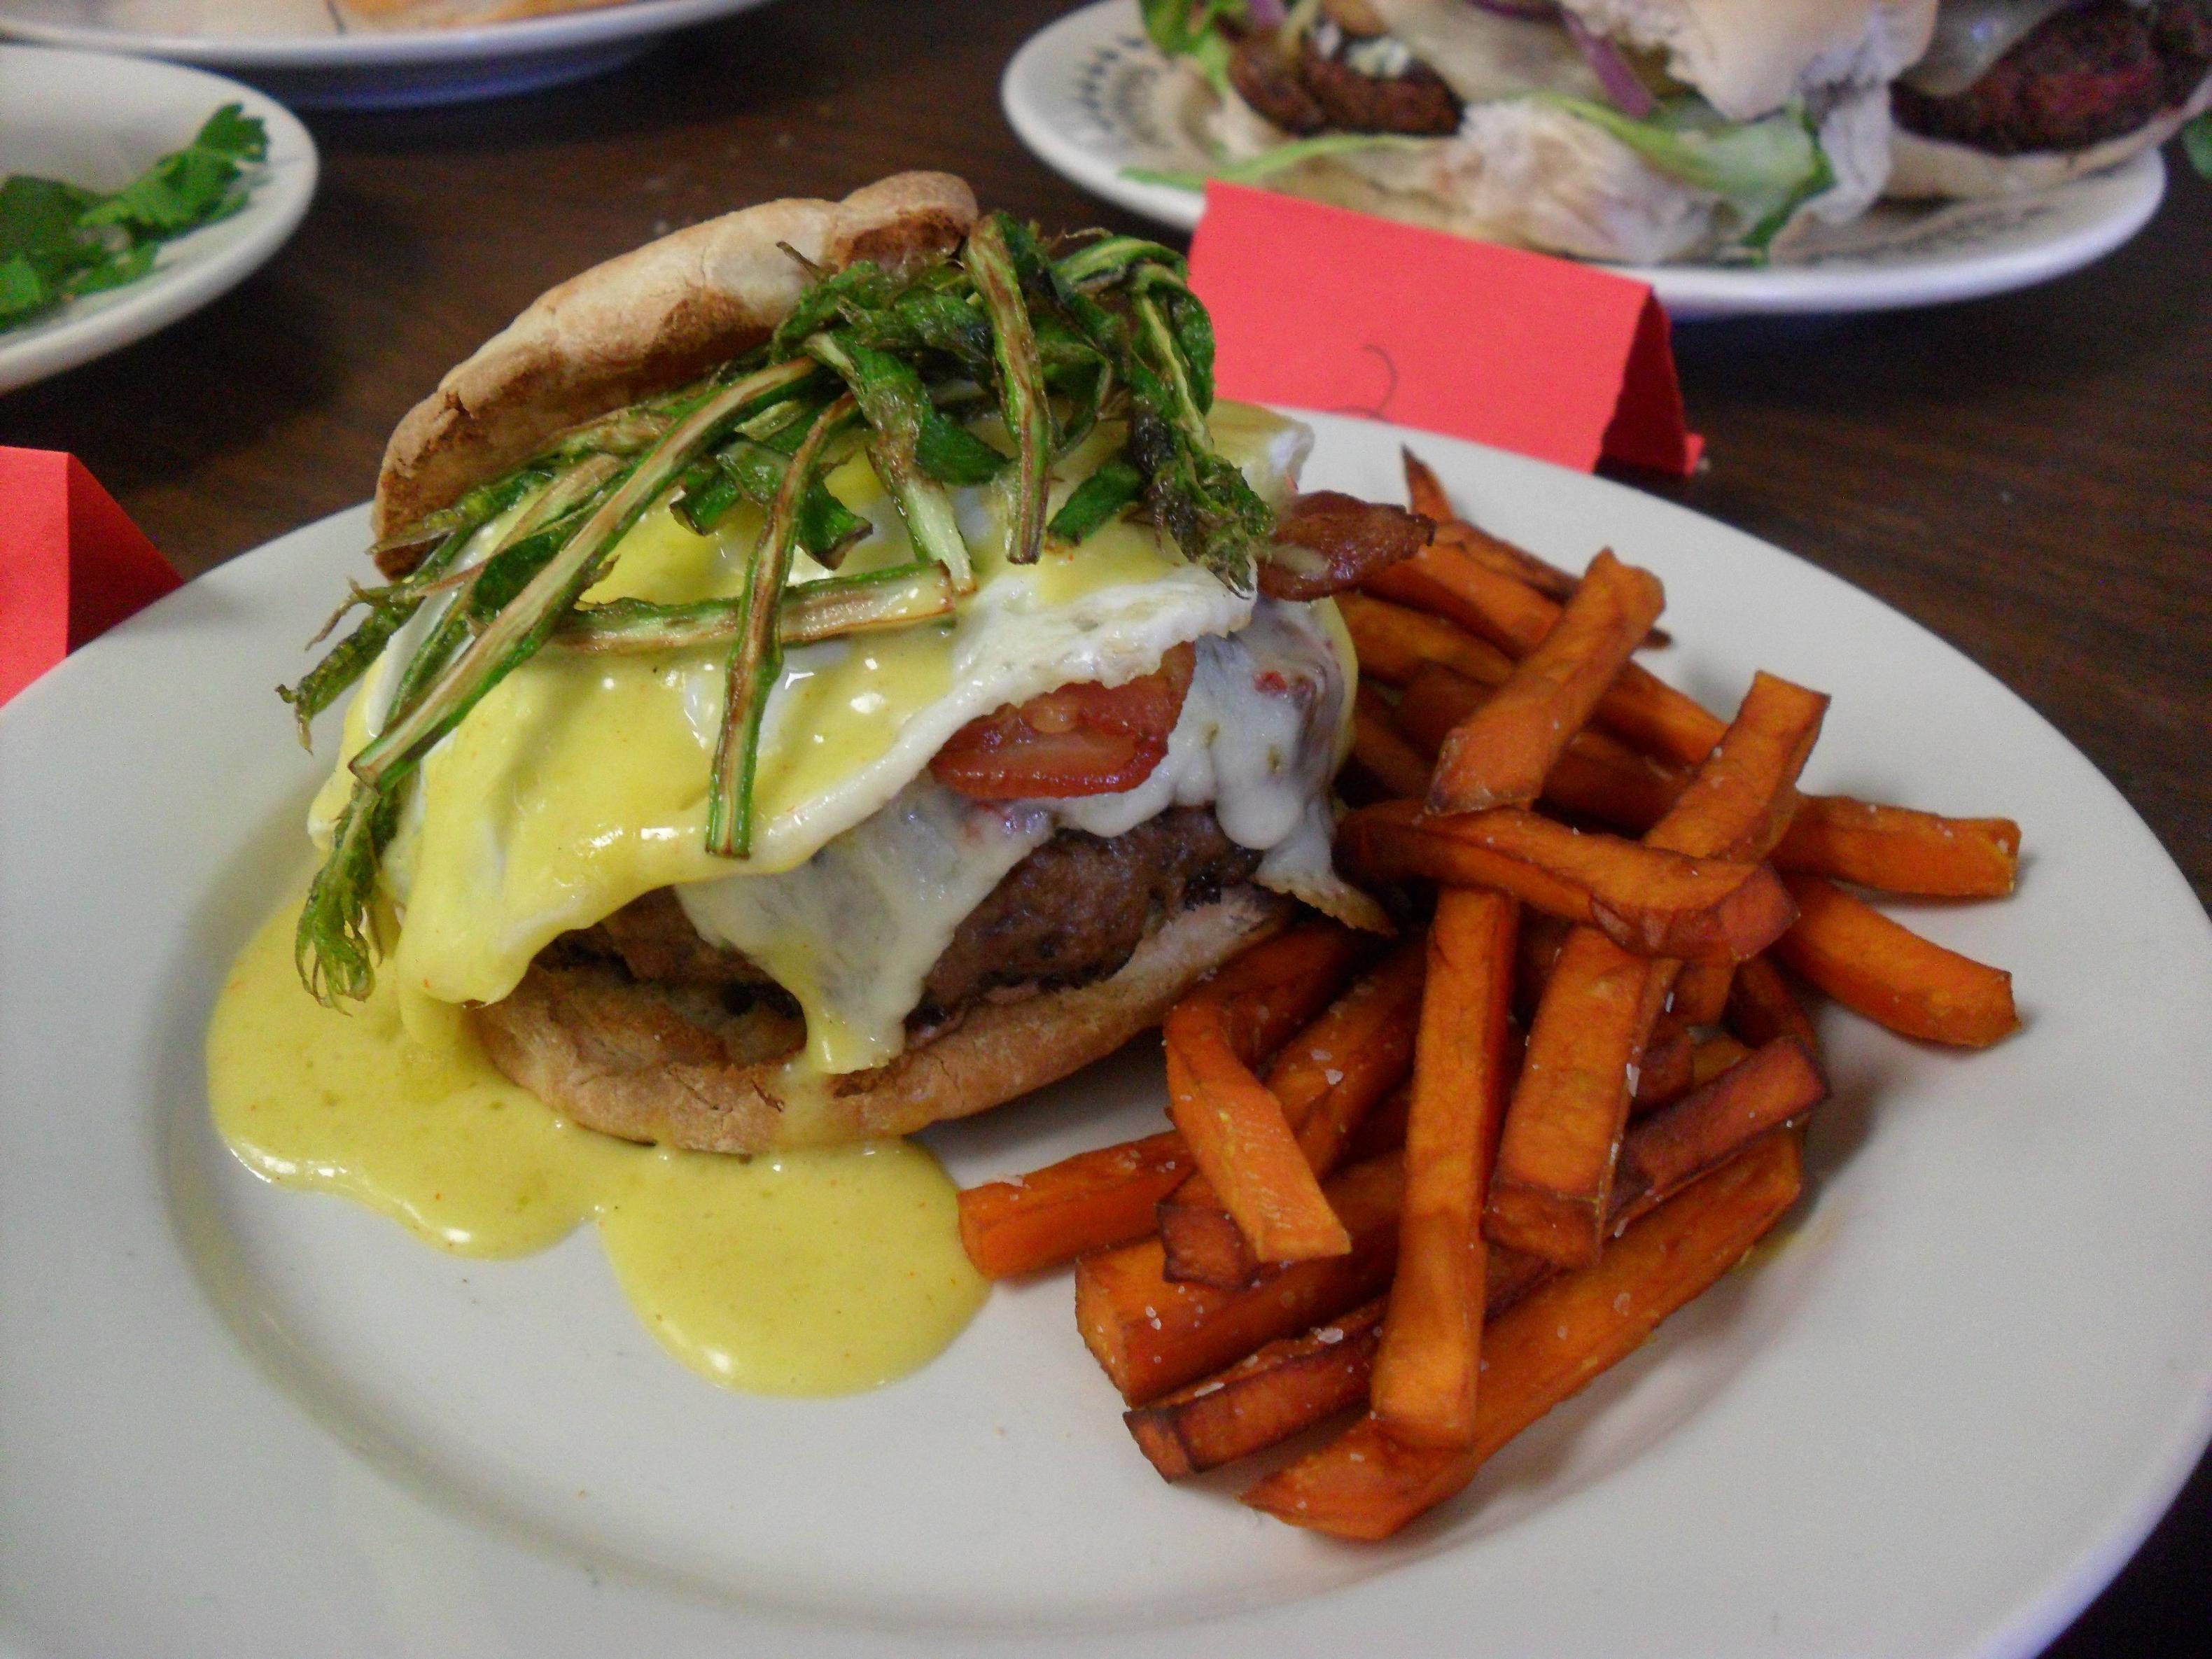 Recipe for goetta burger- yummm: http://www.scribd.com/doc/67795836/Goetta-Burger